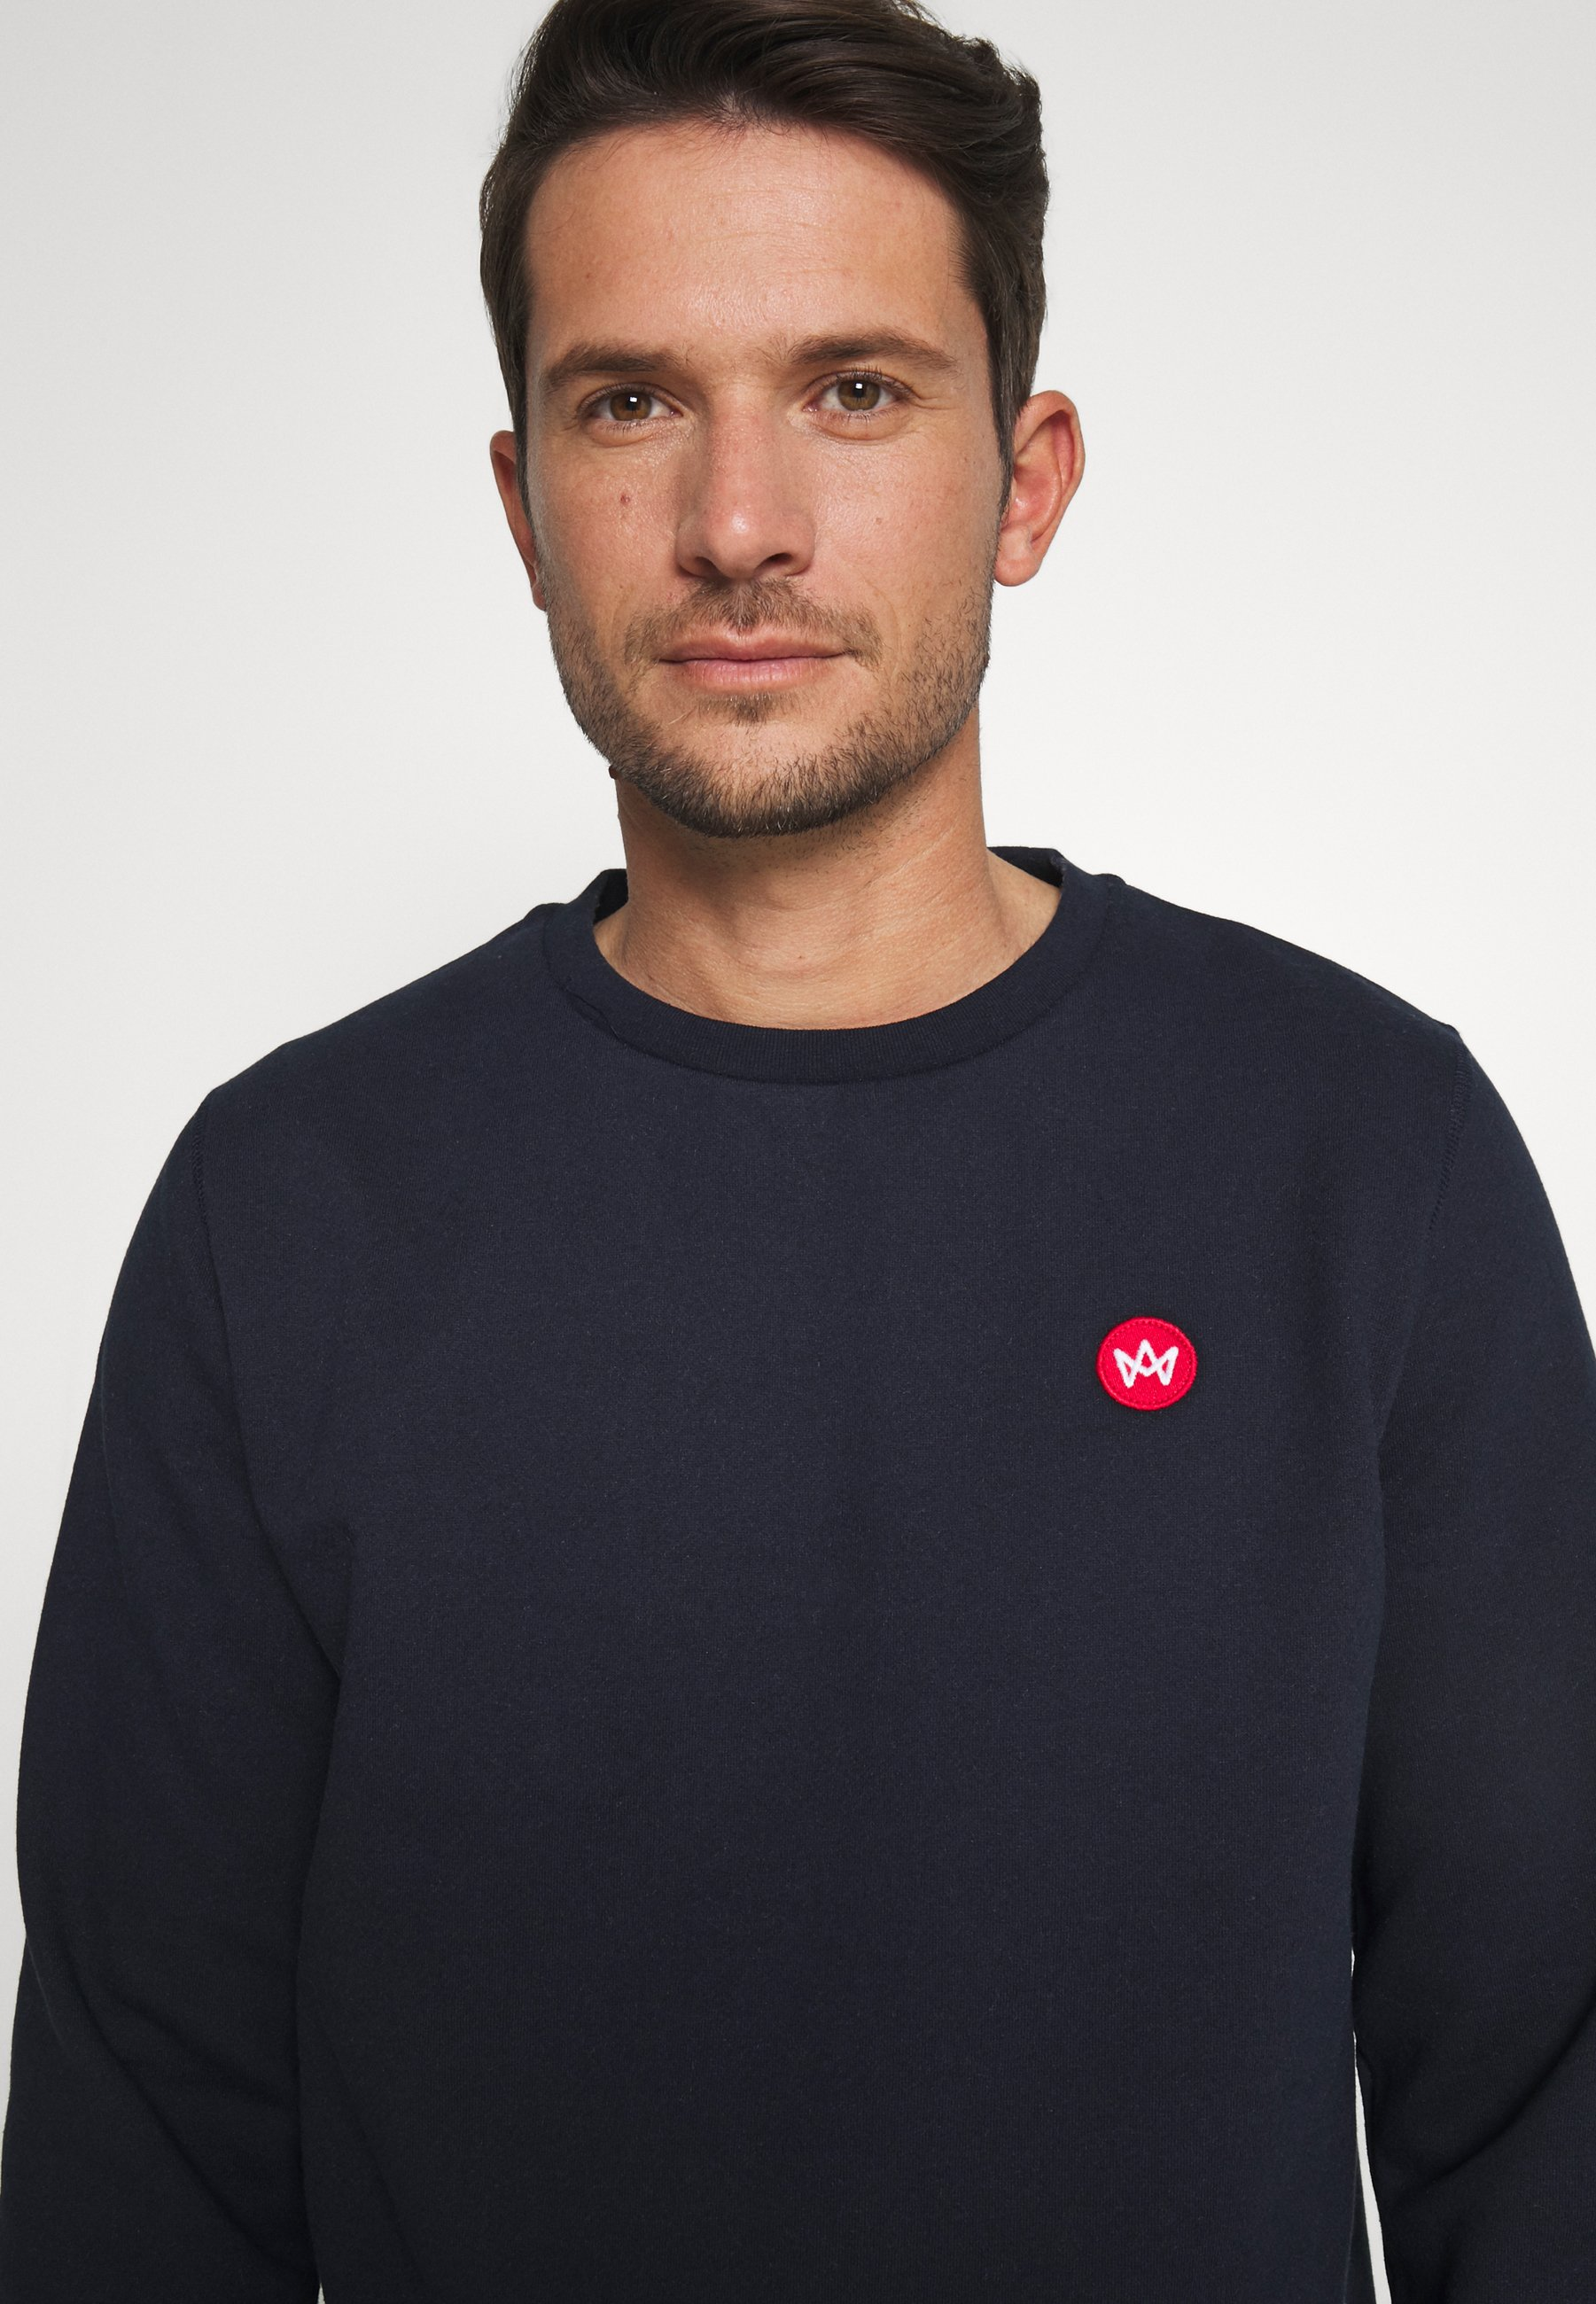 Kronstadt Lars Recycled - Sweatshirt Navy/mørkeblå